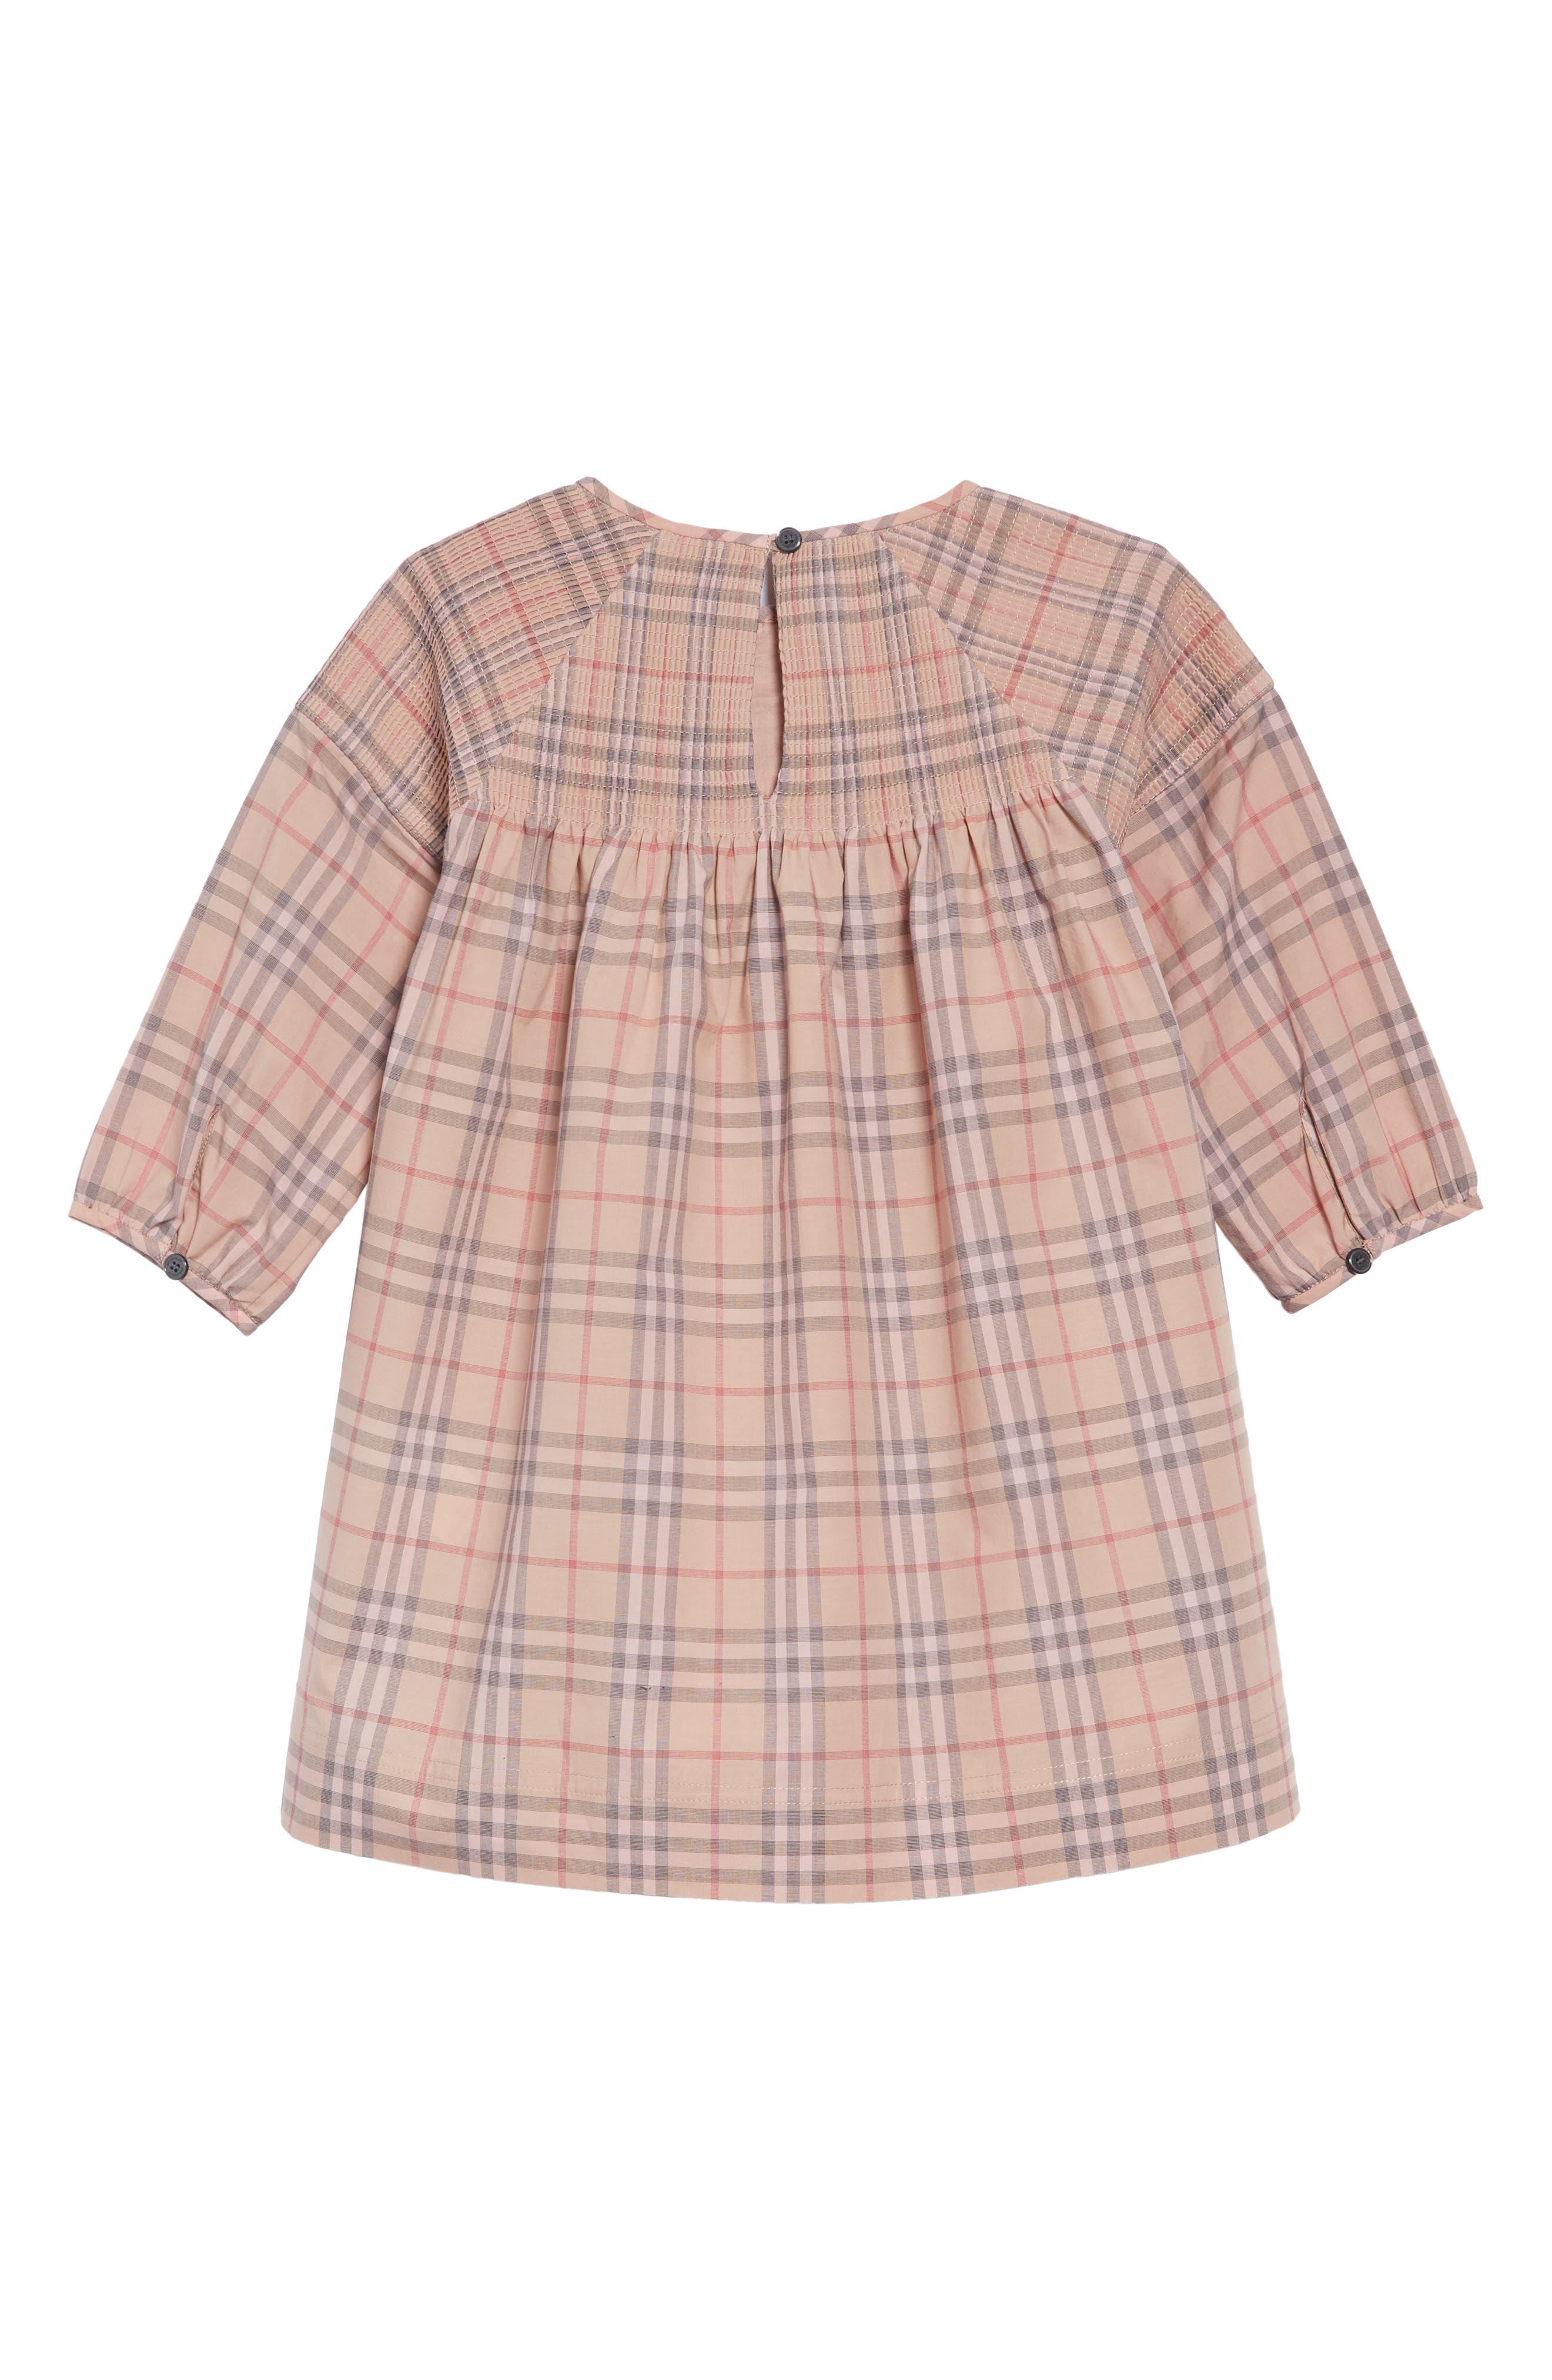 Mini Loralie Ruffle Detail Check Cotton Dress,                             Alternate thumbnail 2, color,                             PALE PINK